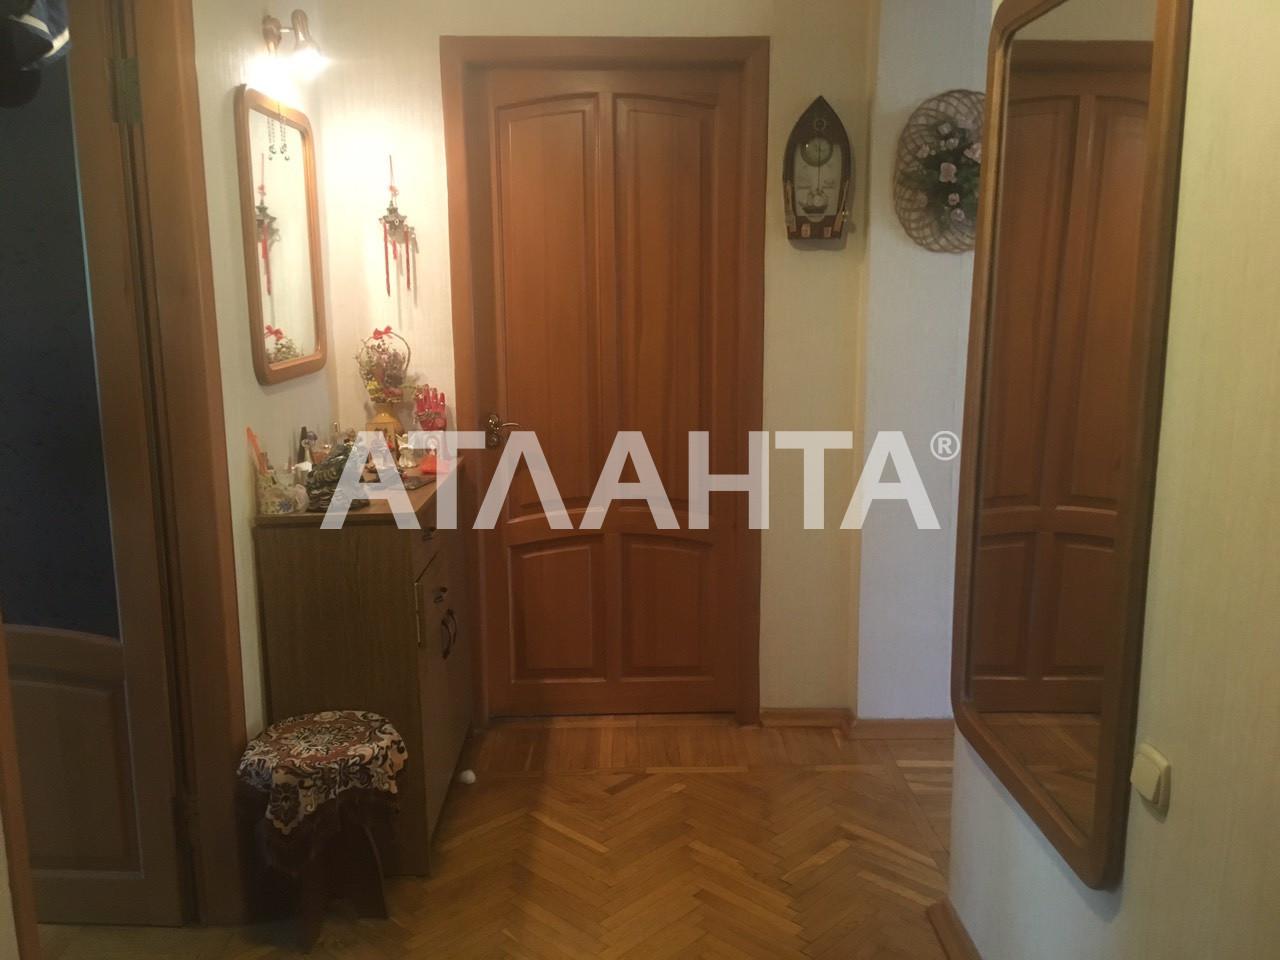 Продается 3-комнатная Квартира на ул. Шевченко Пр. — 72 000 у.е. (фото №7)